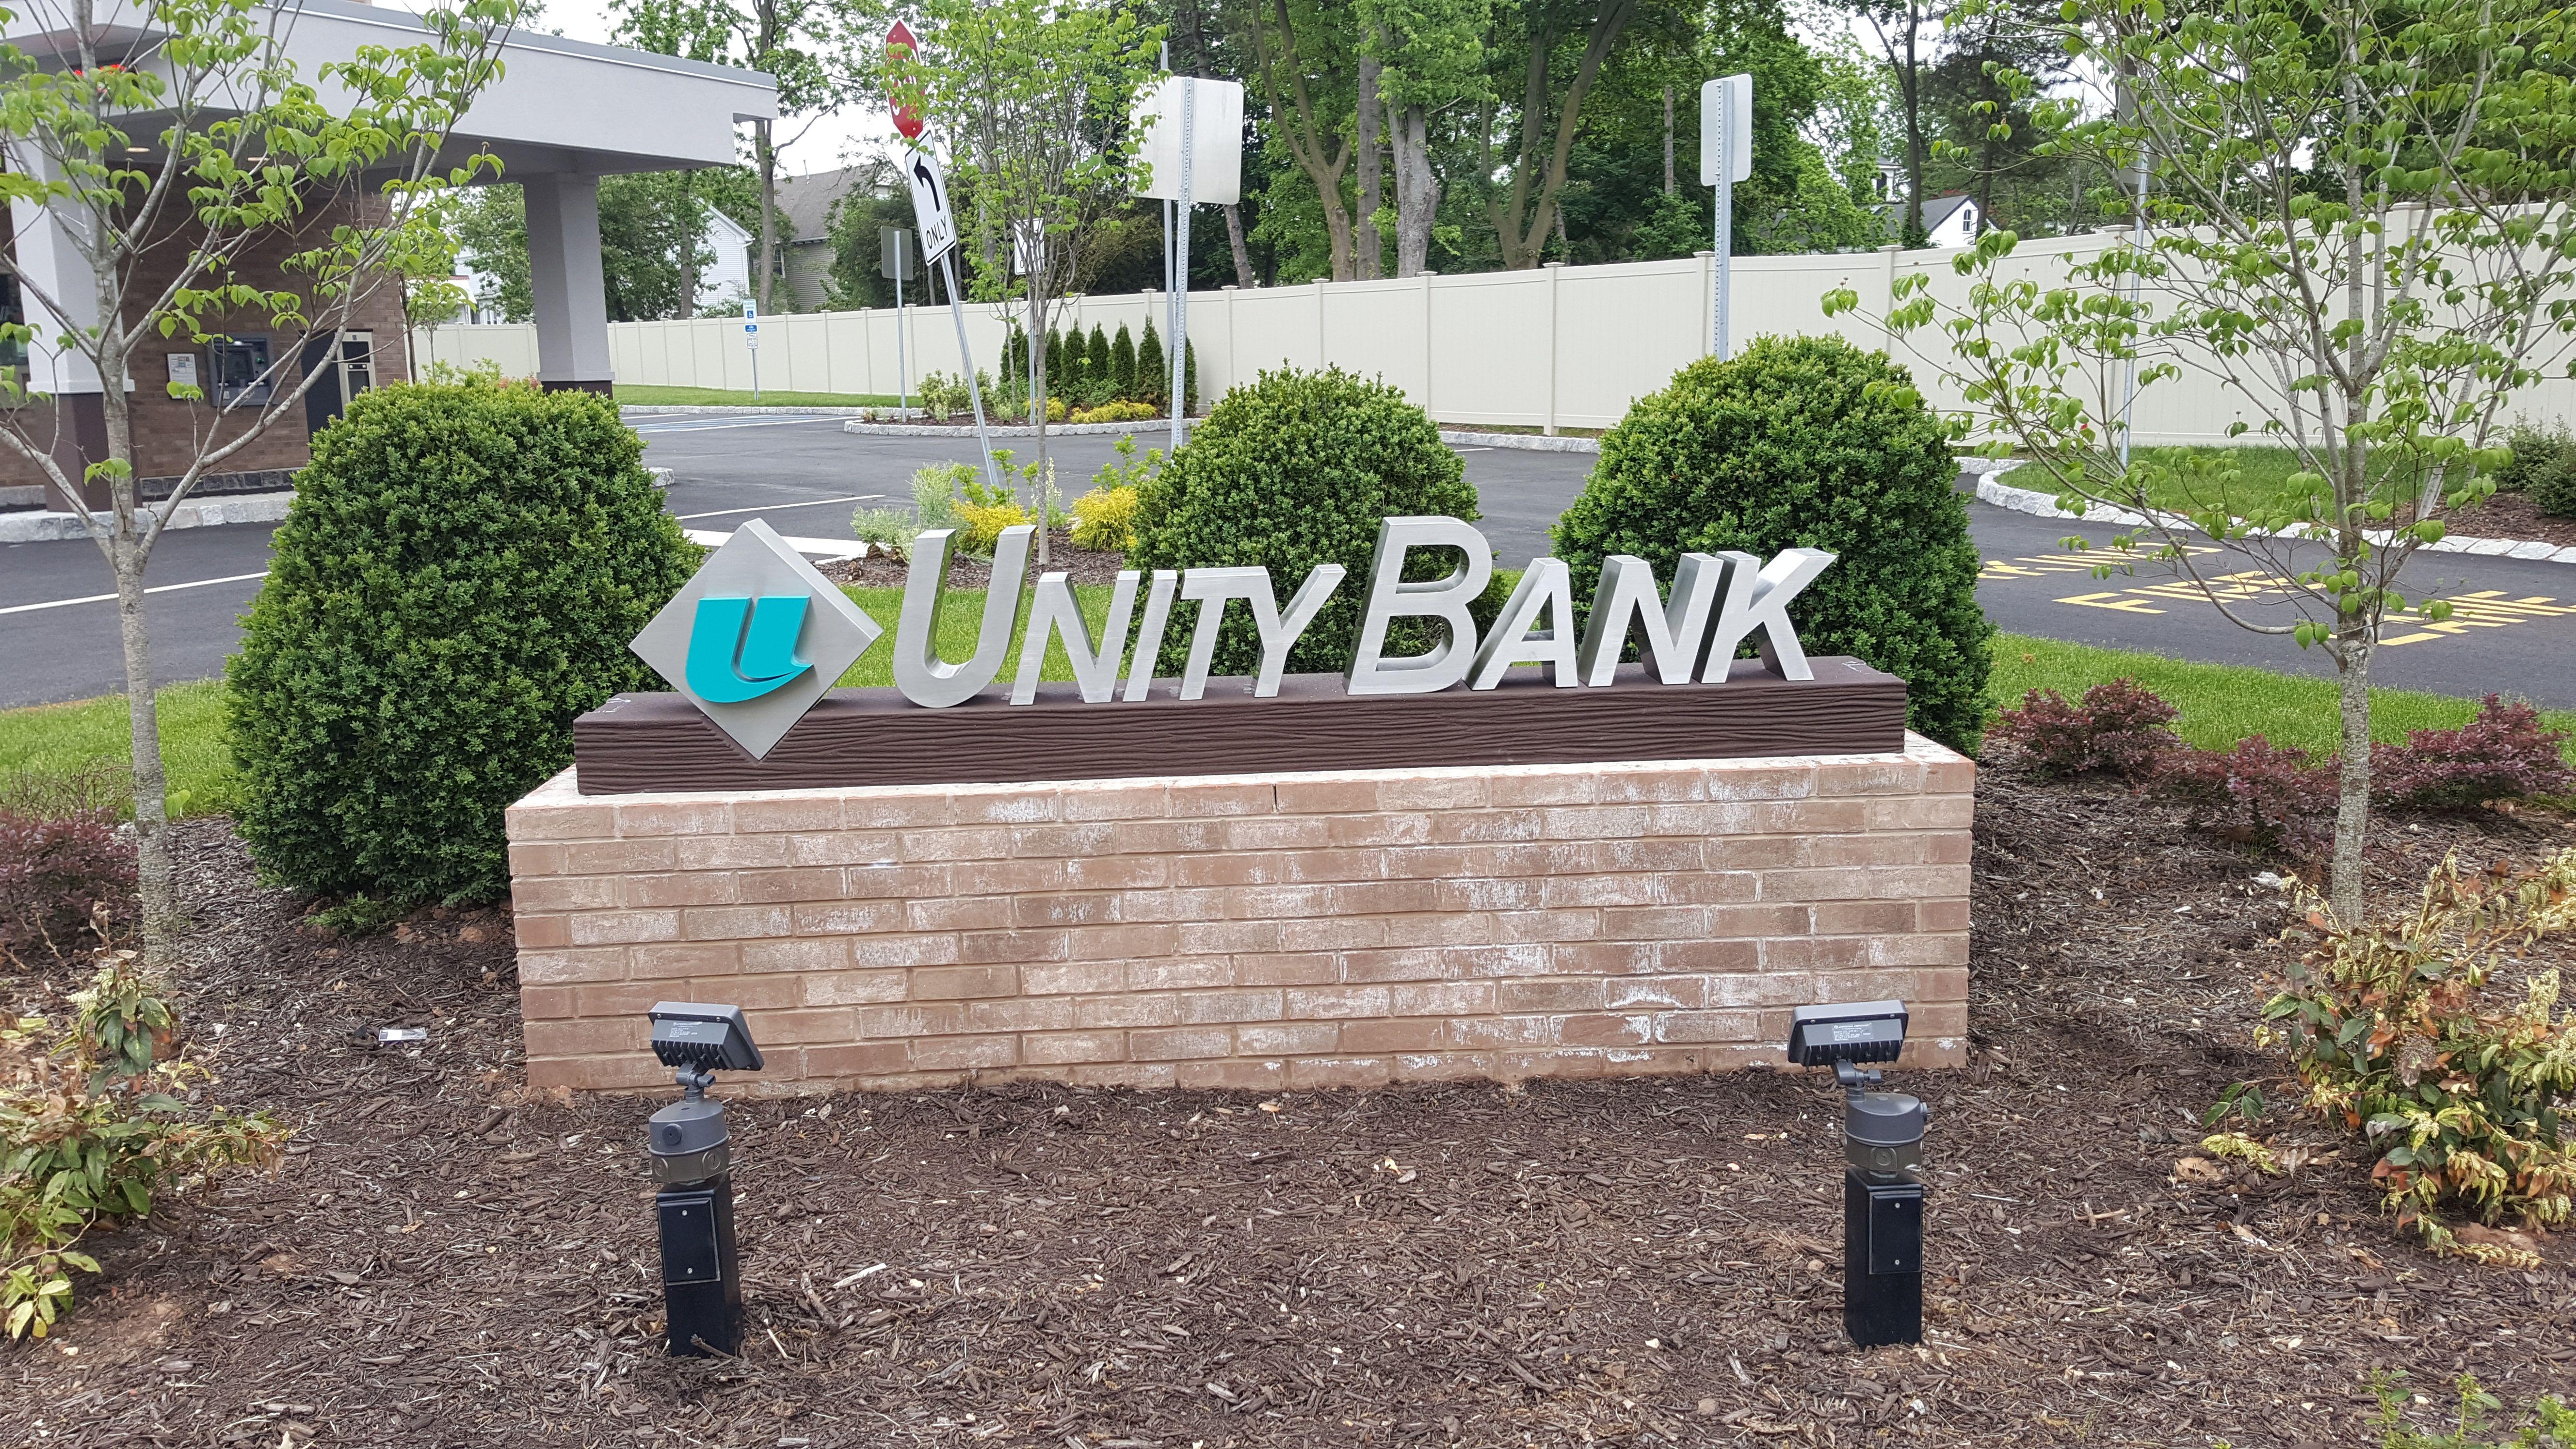 Unity Bank, Somerville, NJ